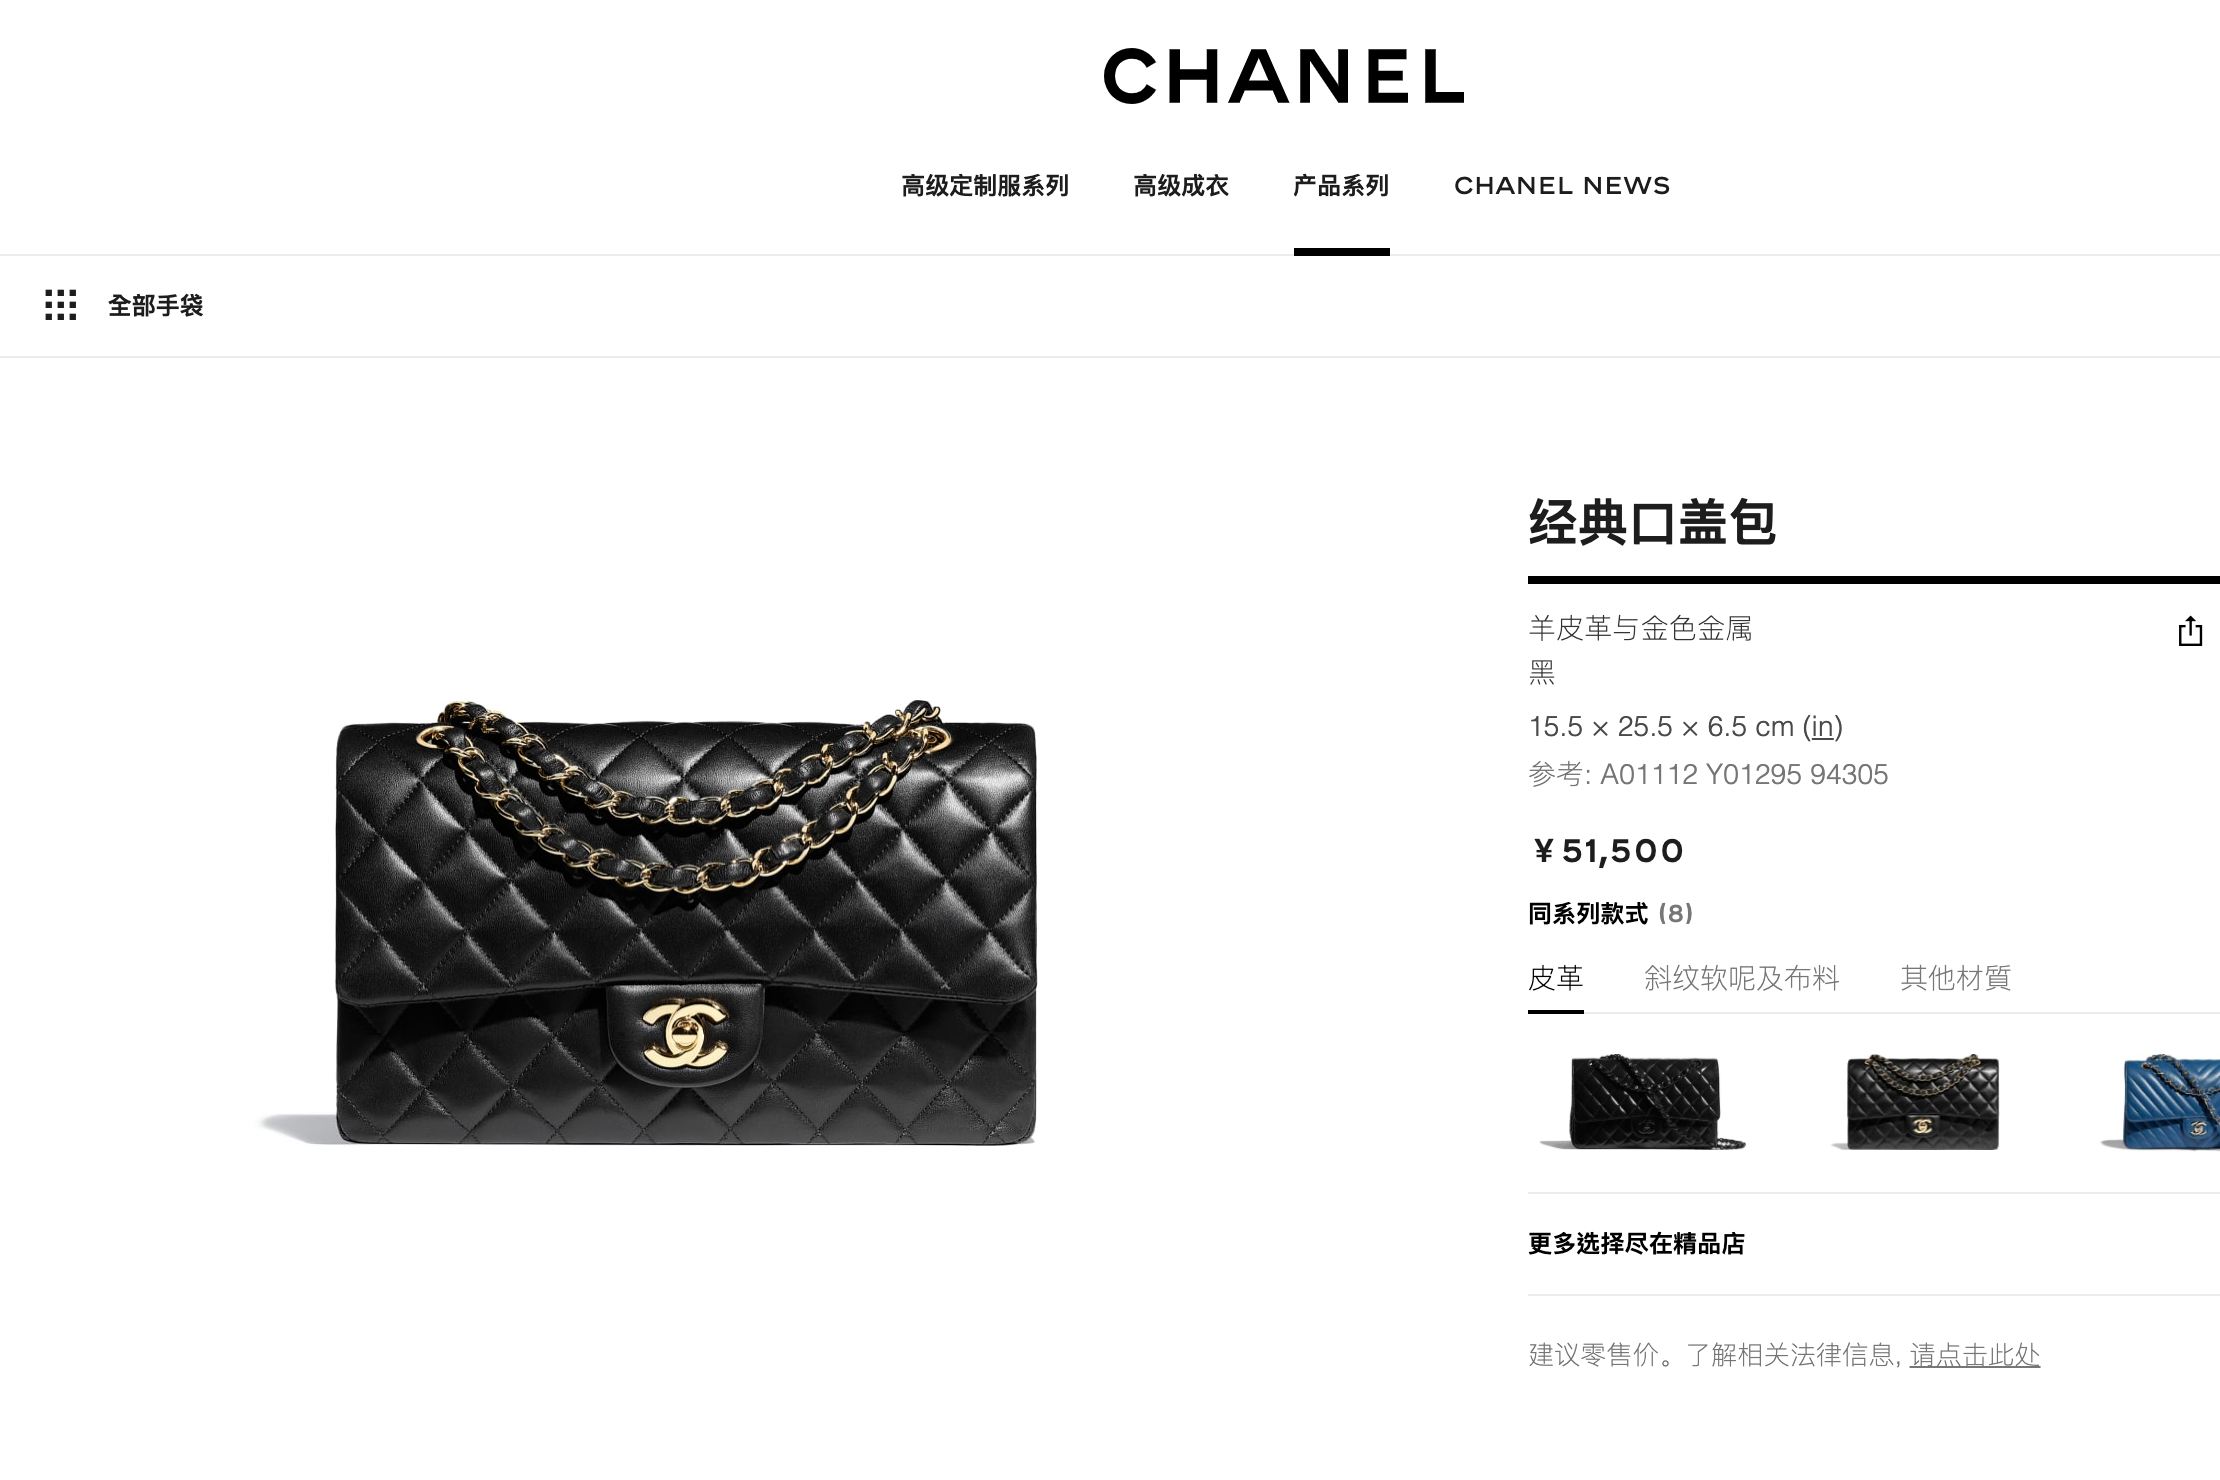 Chanel 今年内第二次涨价,其他奢侈品牌会跟进吗?